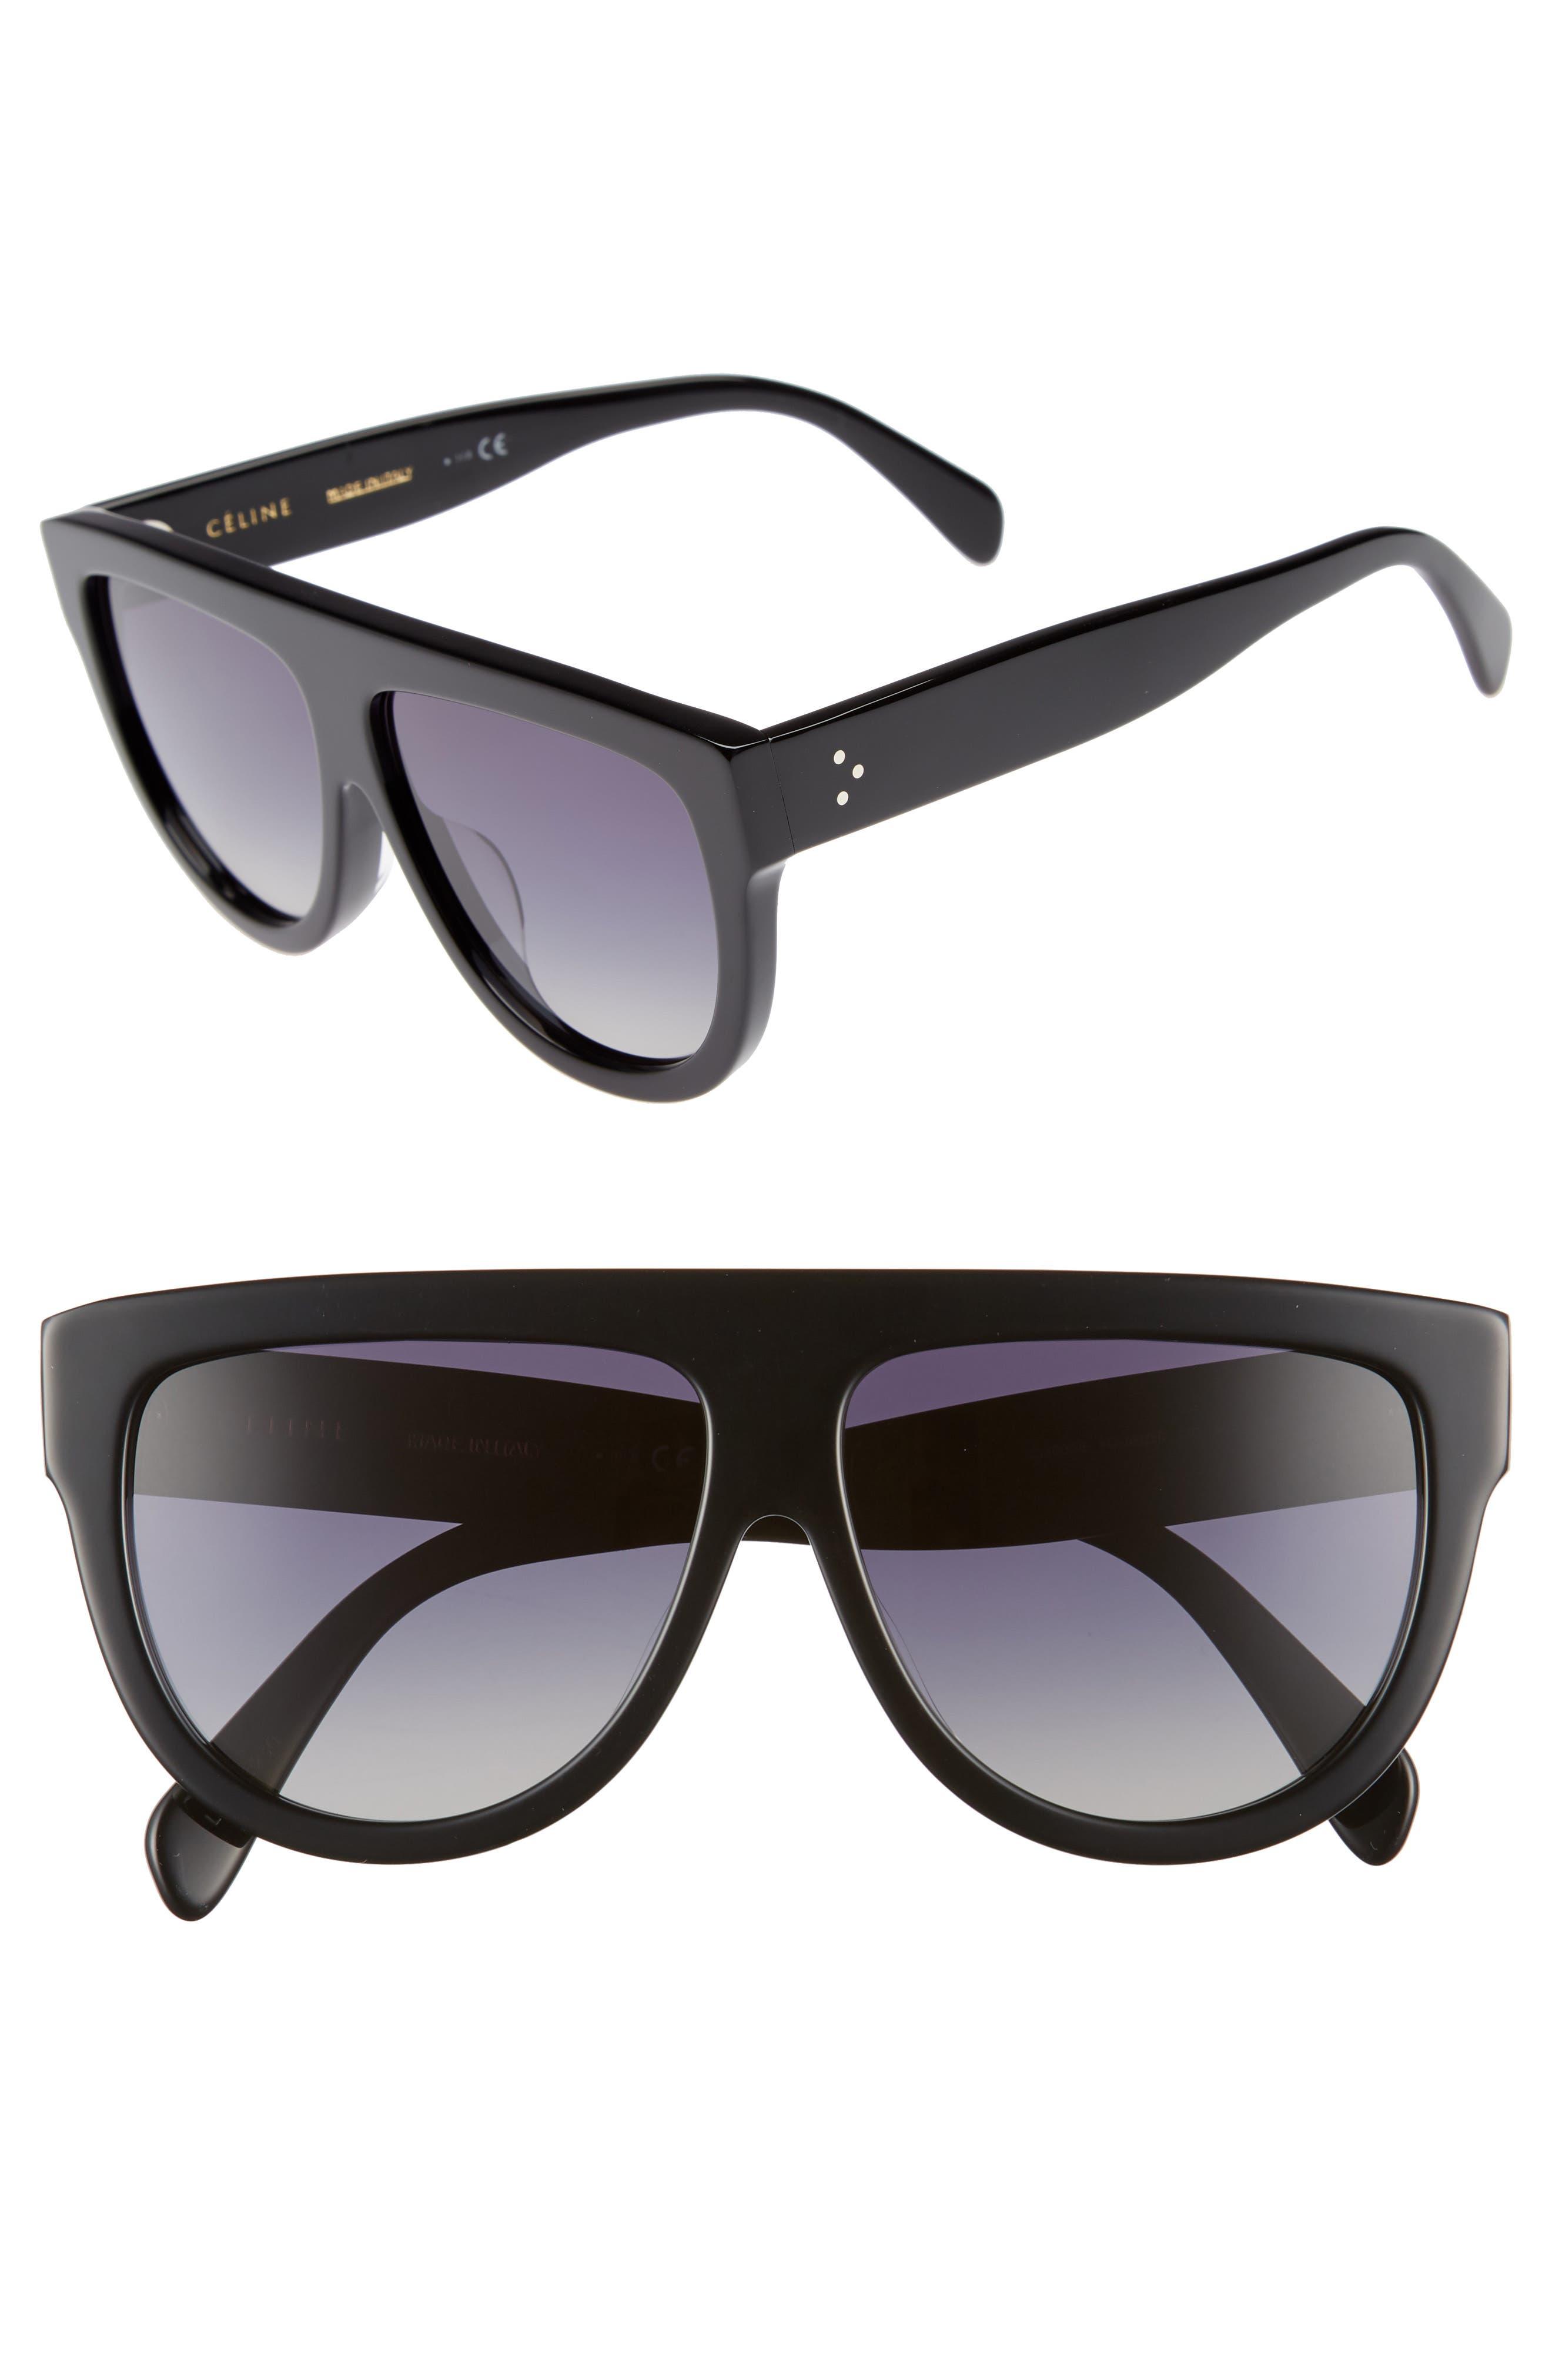 Special Fit 60mm Polarized Gradient Flat Top Sunglasses,                             Main thumbnail 1, color,                             BLACK/ GRADIENT SMOKE